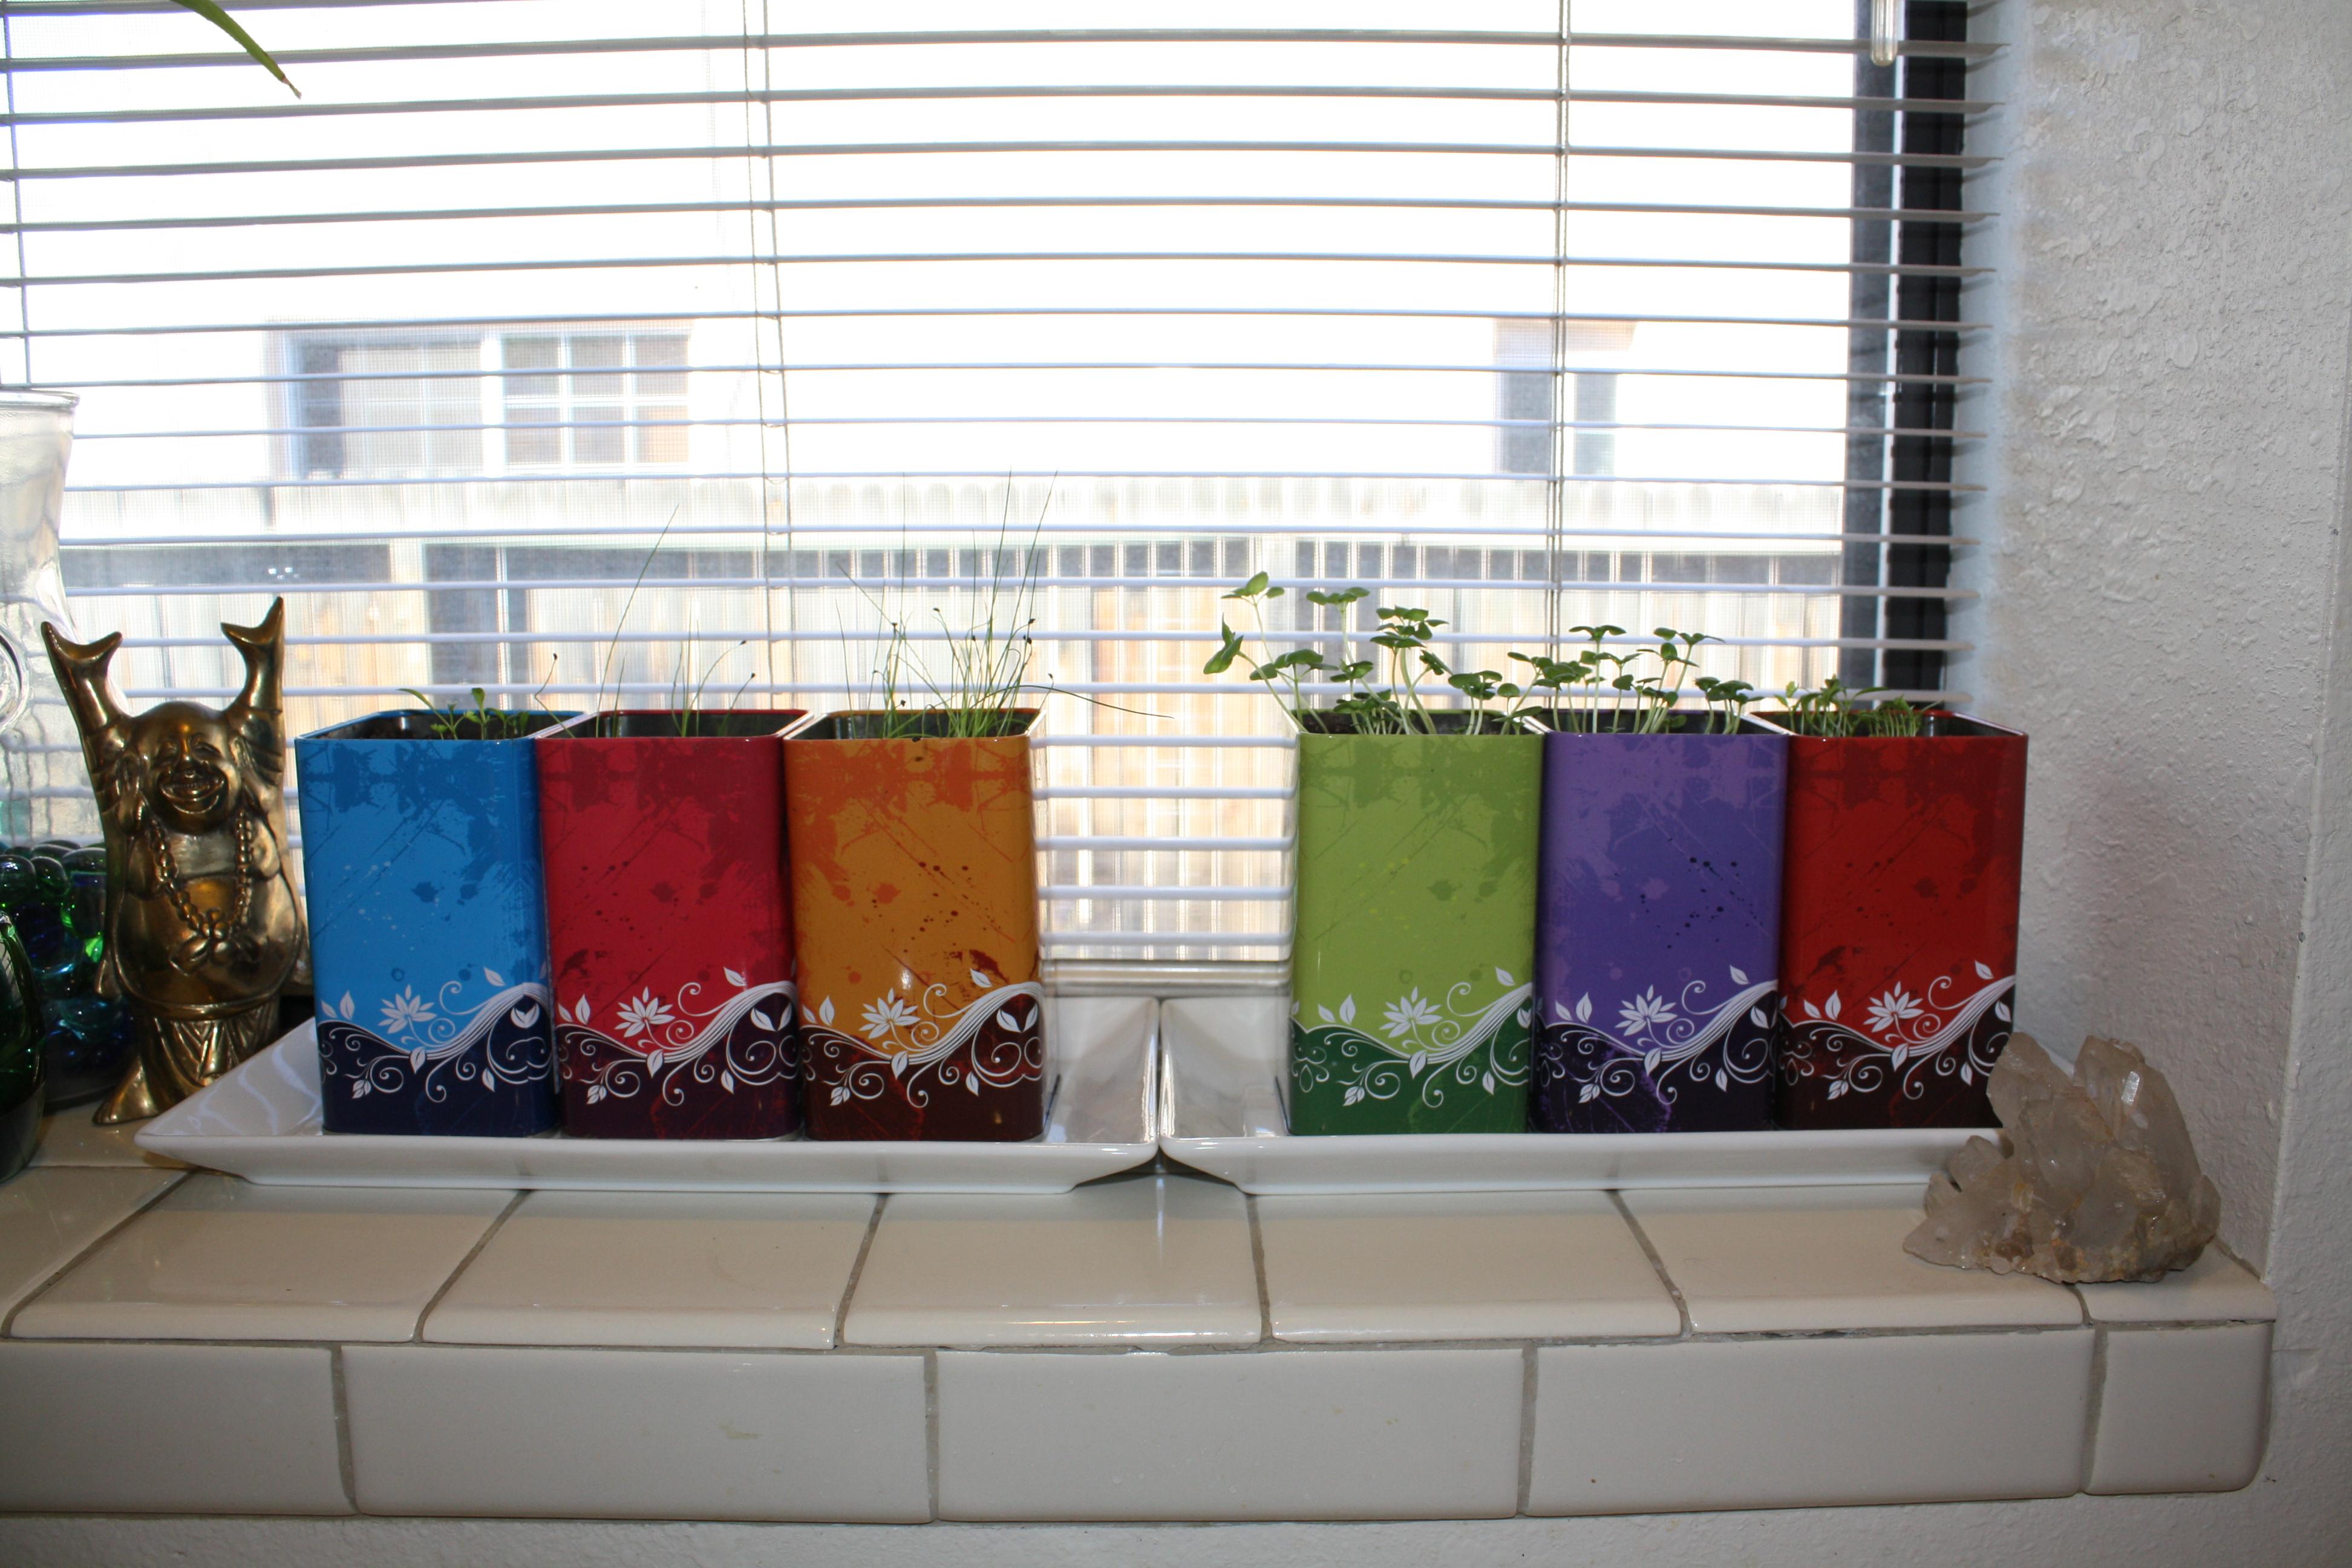 Kitchen Window Herb Garden Kit Ode To Kitchen Windowsill Plants Good To Grow